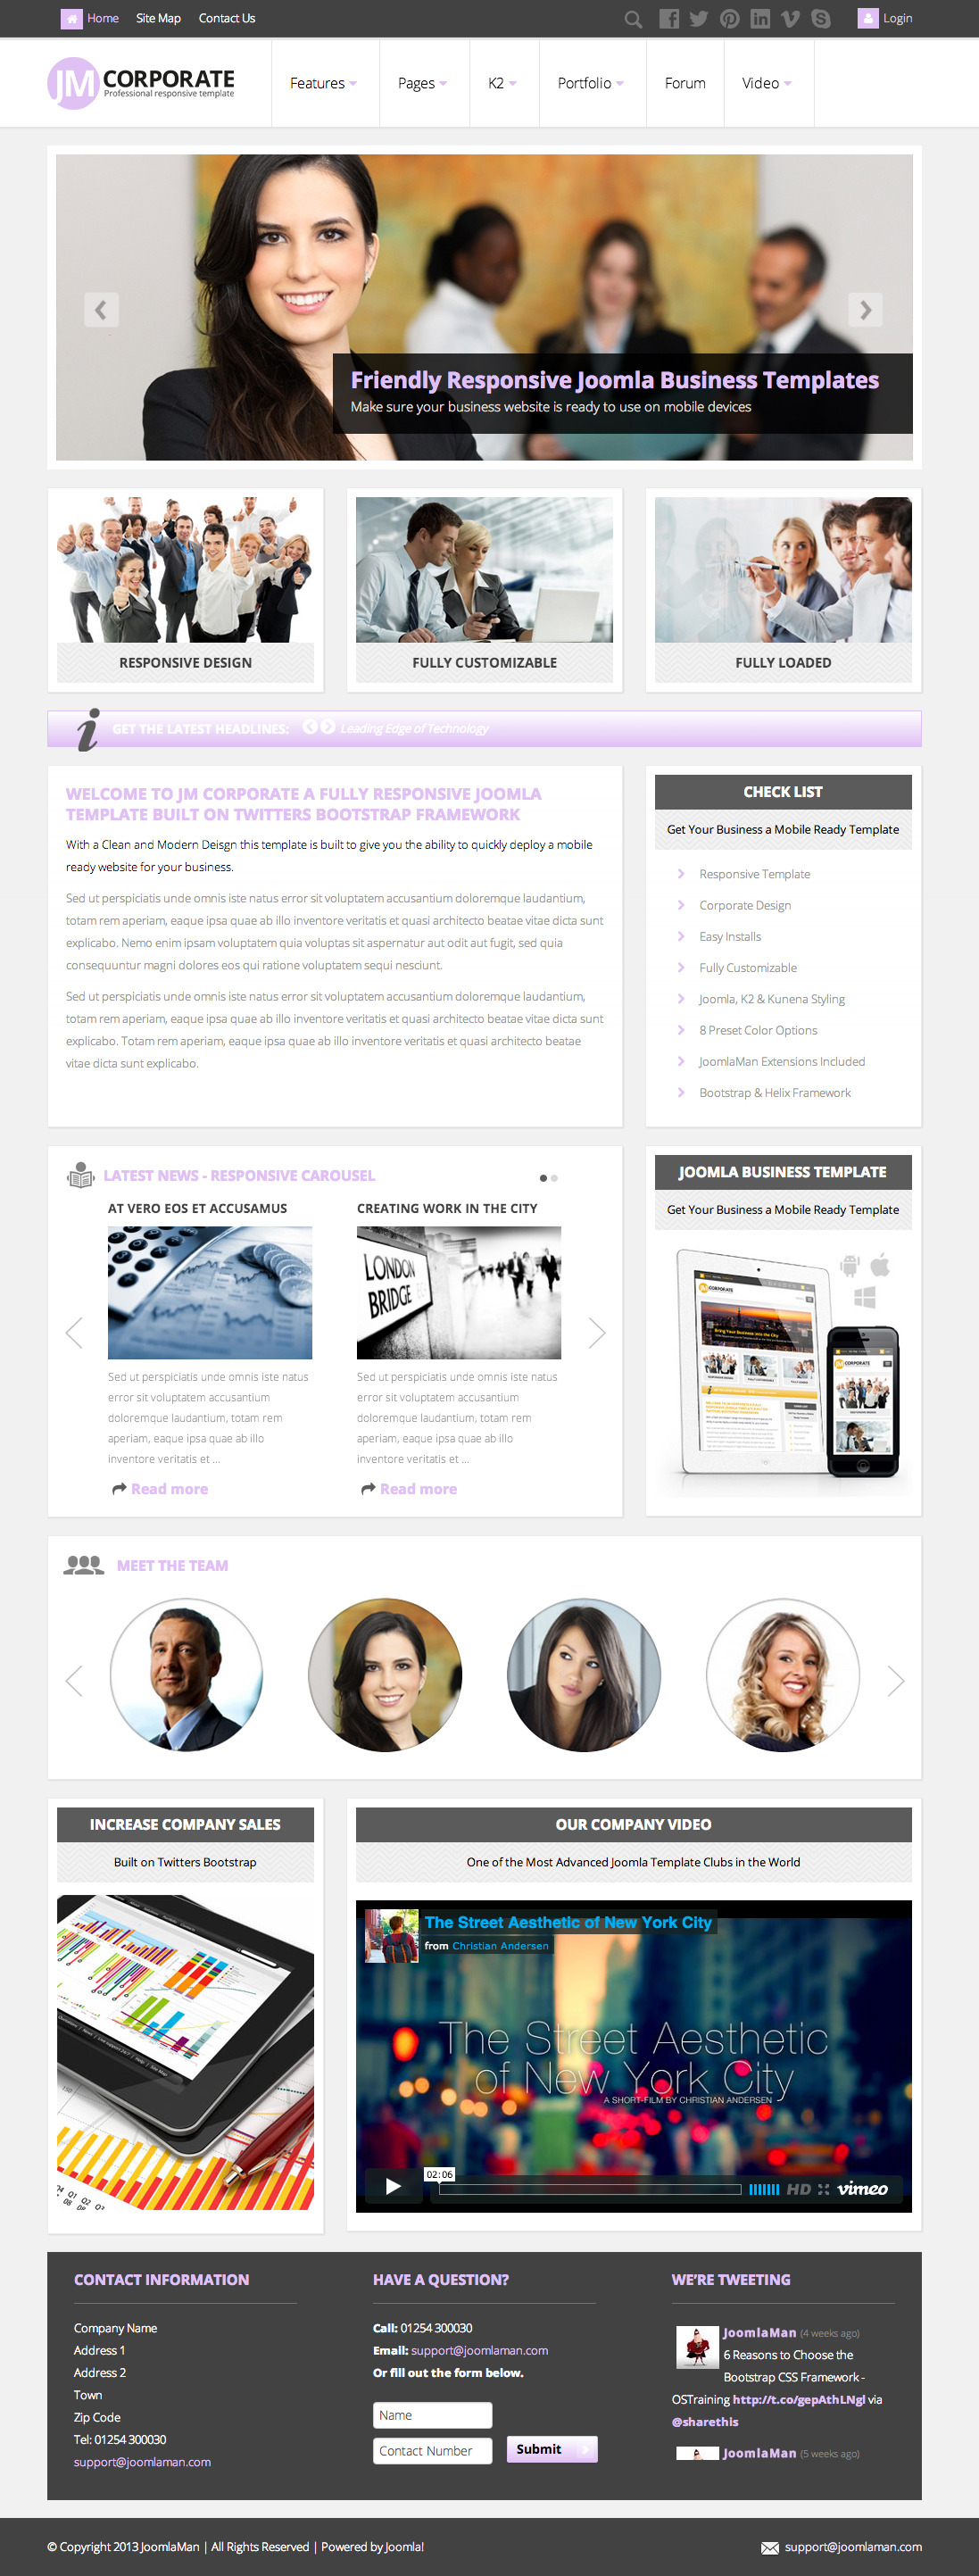 JM Corporate, Responsive Joomla Business Template